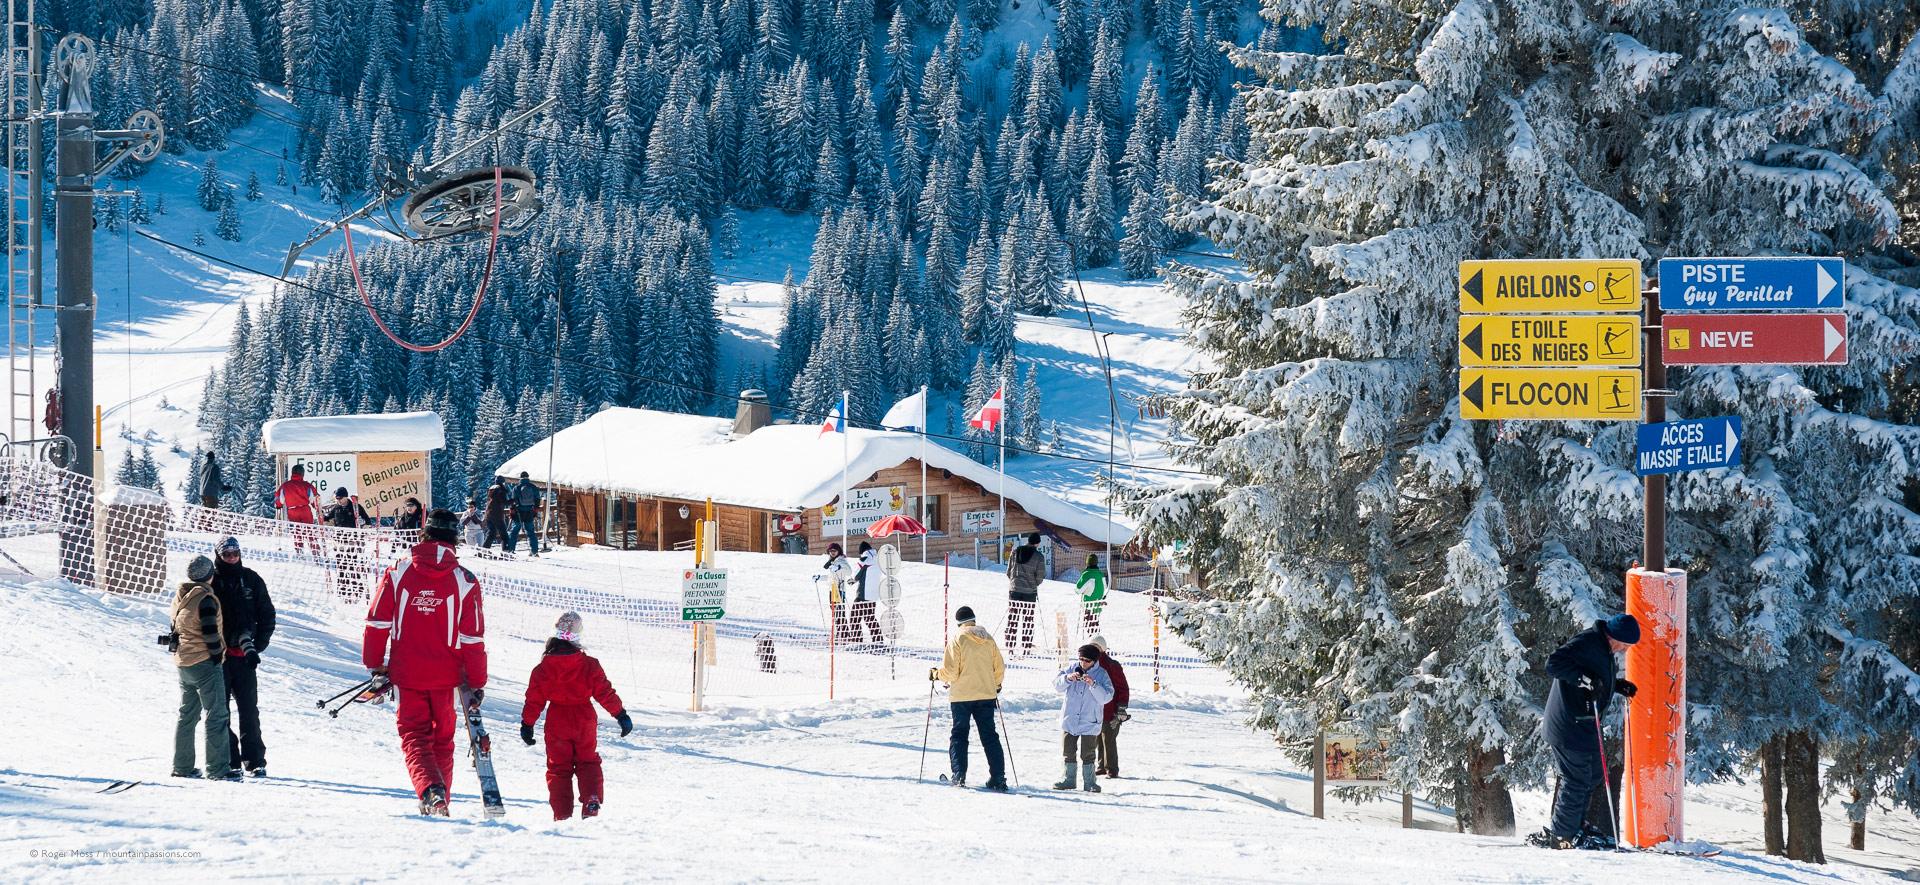 Skiers and ski instructor around debutant area in La Clausaz ski area